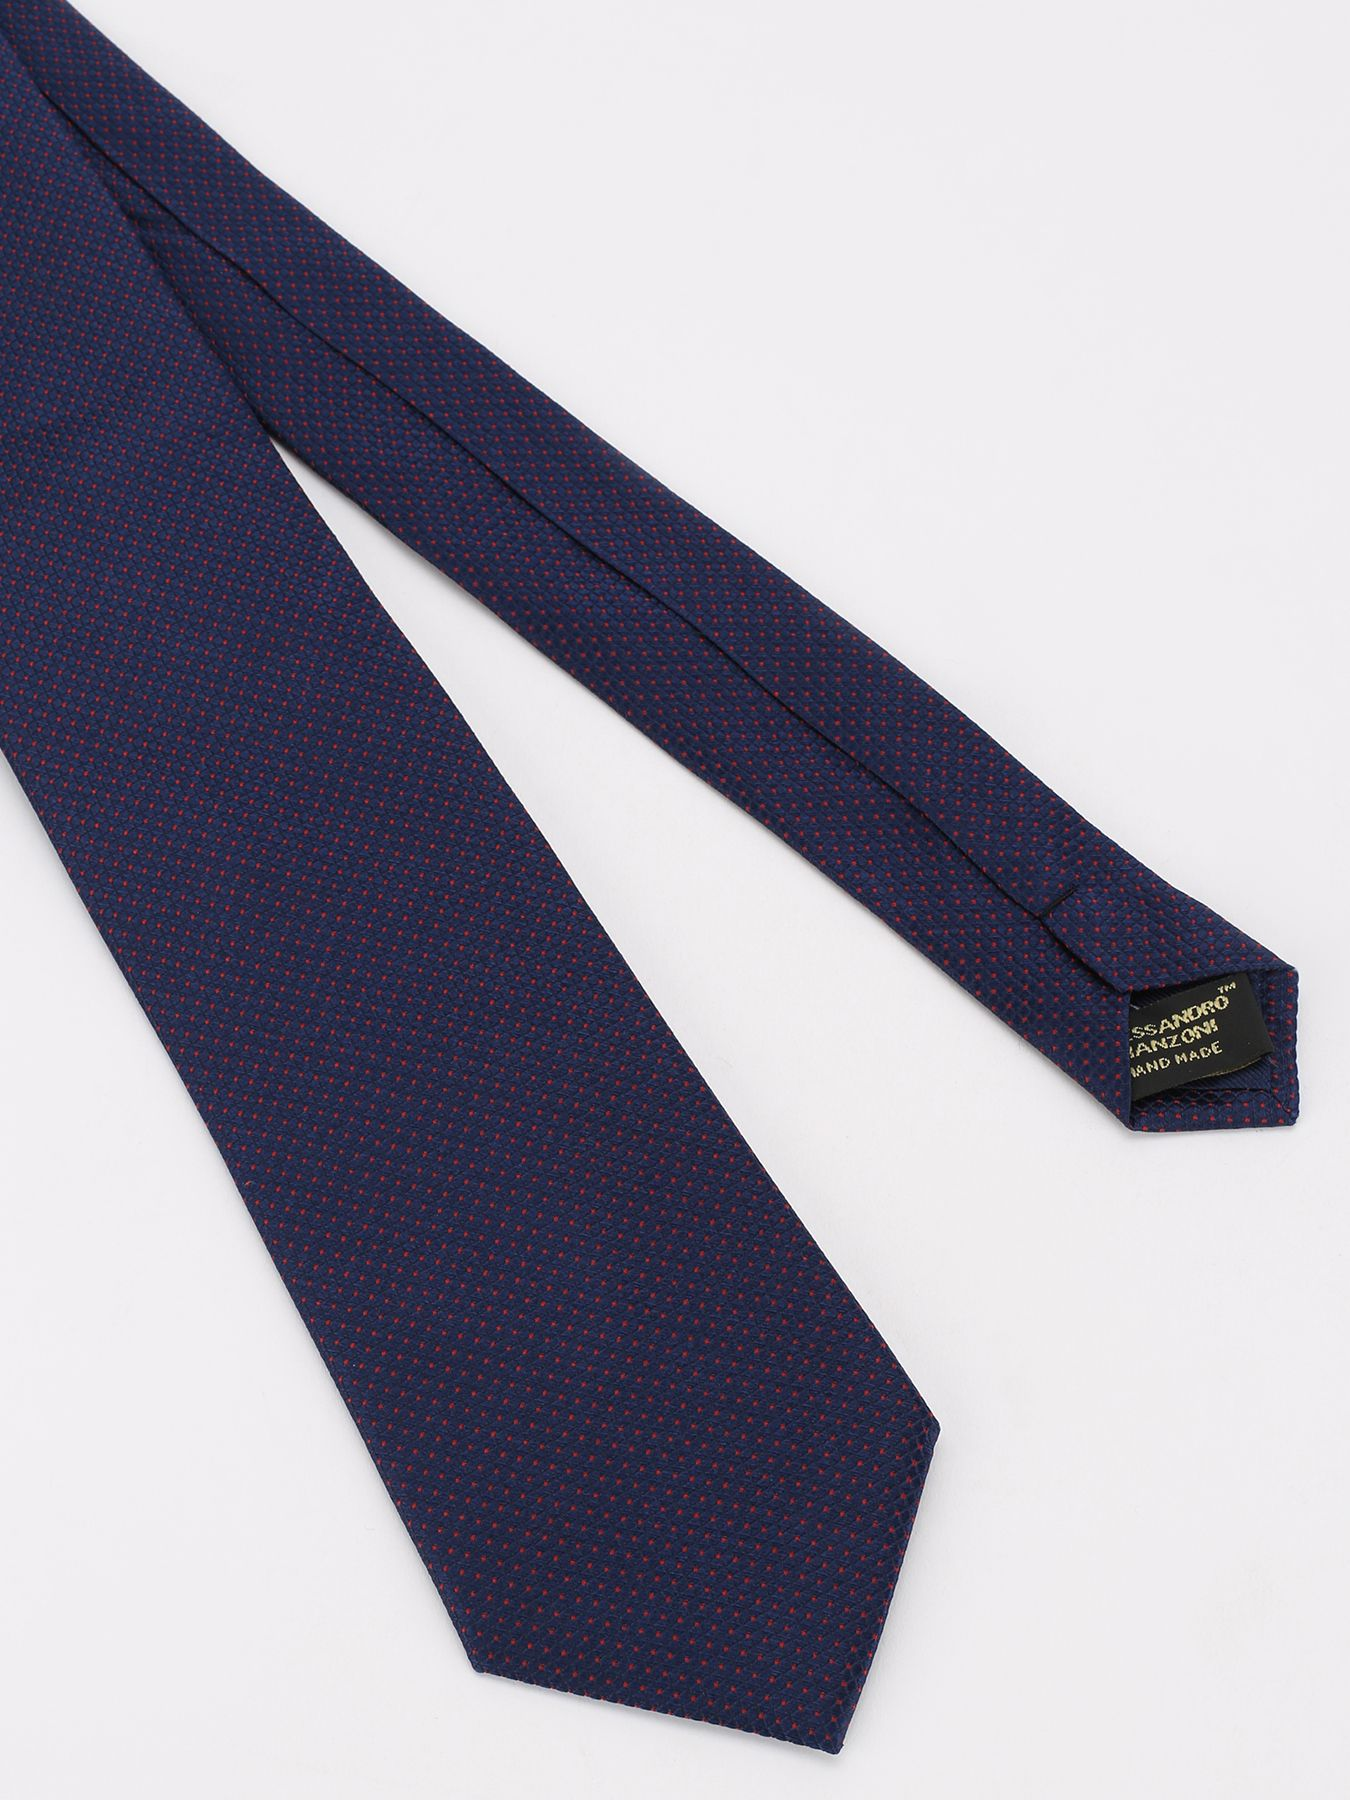 Alessandro Manzoni Шелковый галстук с узорами 324186-185 Фото 3